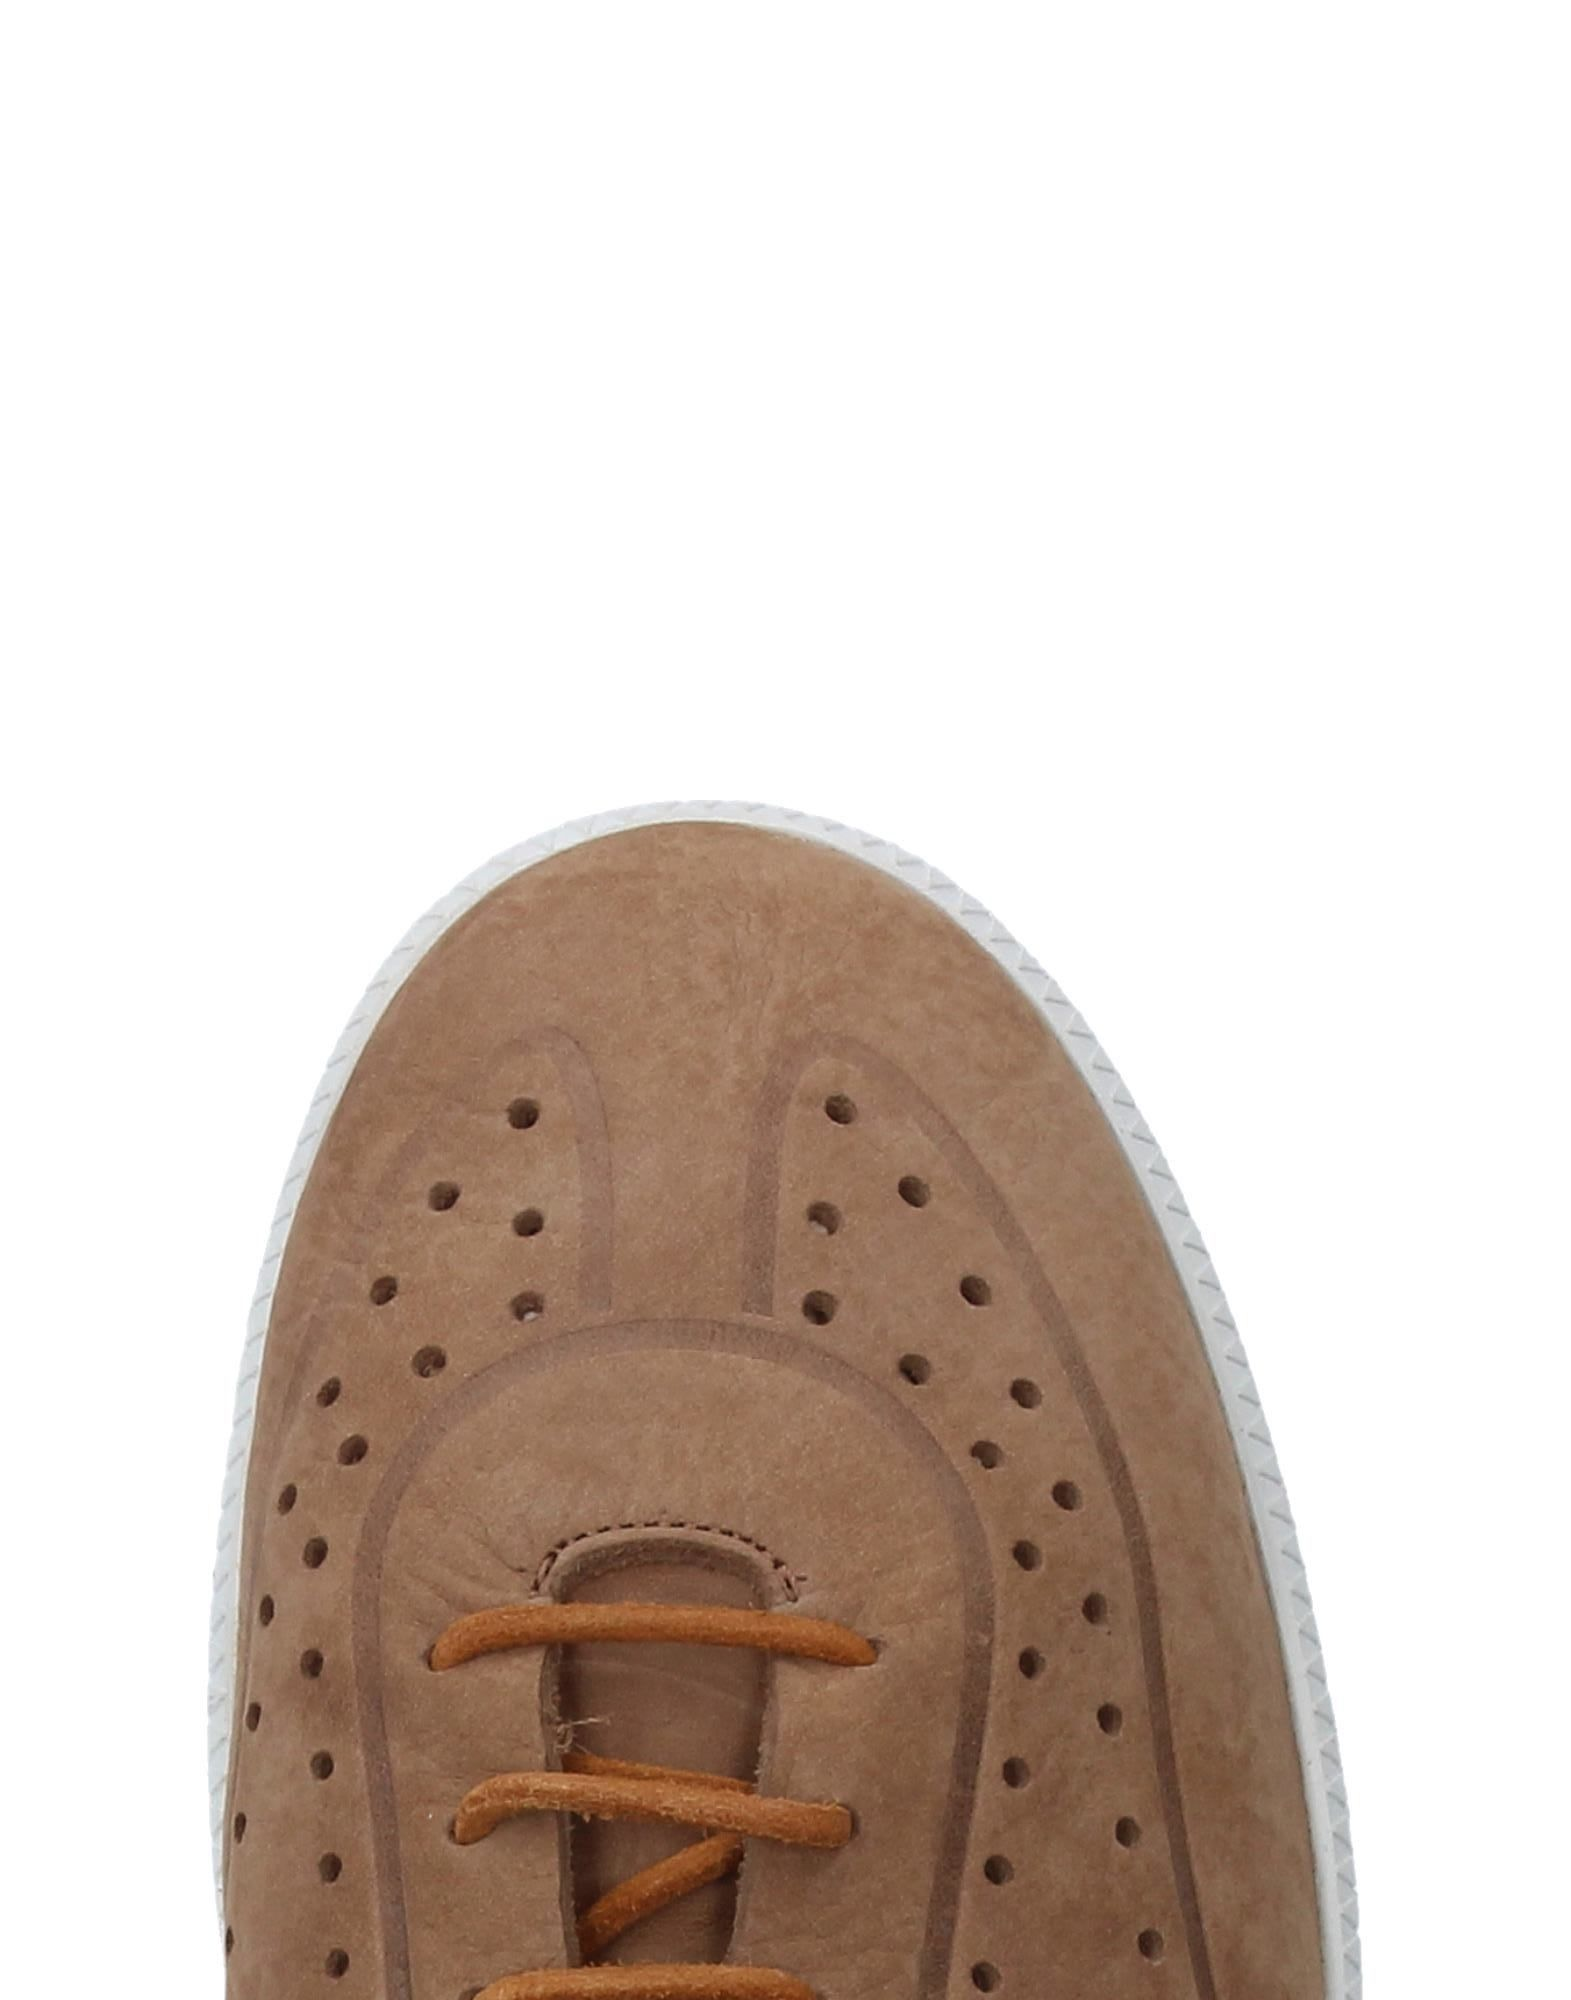 N.D.C. - Made By Hand Sneakers - N.D.C. Men N.D.C. Made By Hand Sneakers online on  Canada - 11196016JR b61edb